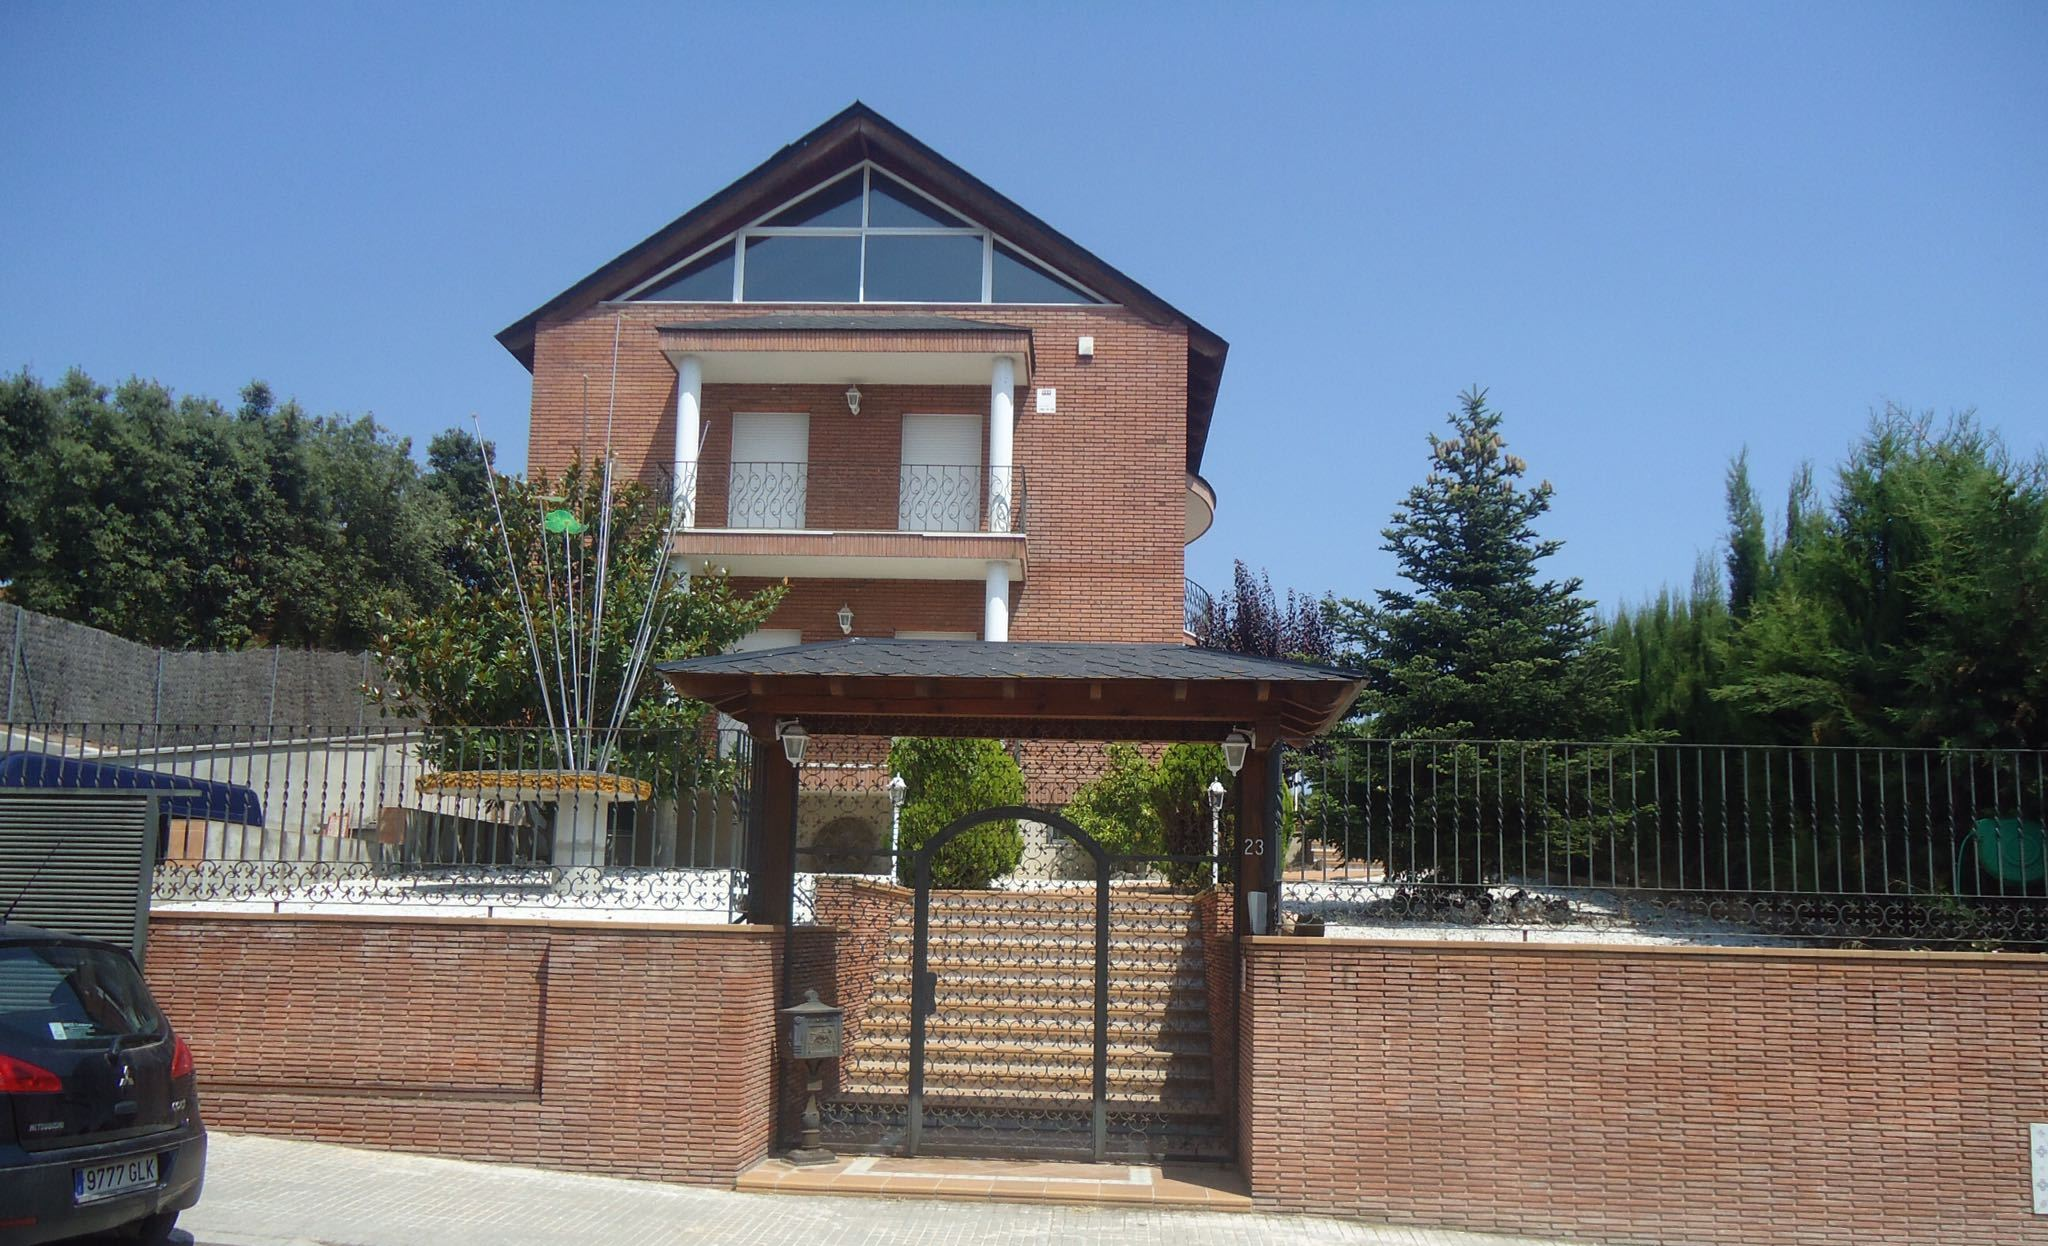 Inmobiliaria familiar con 15 a os de experiencia en el sector for Pisos alquiler vilapicina